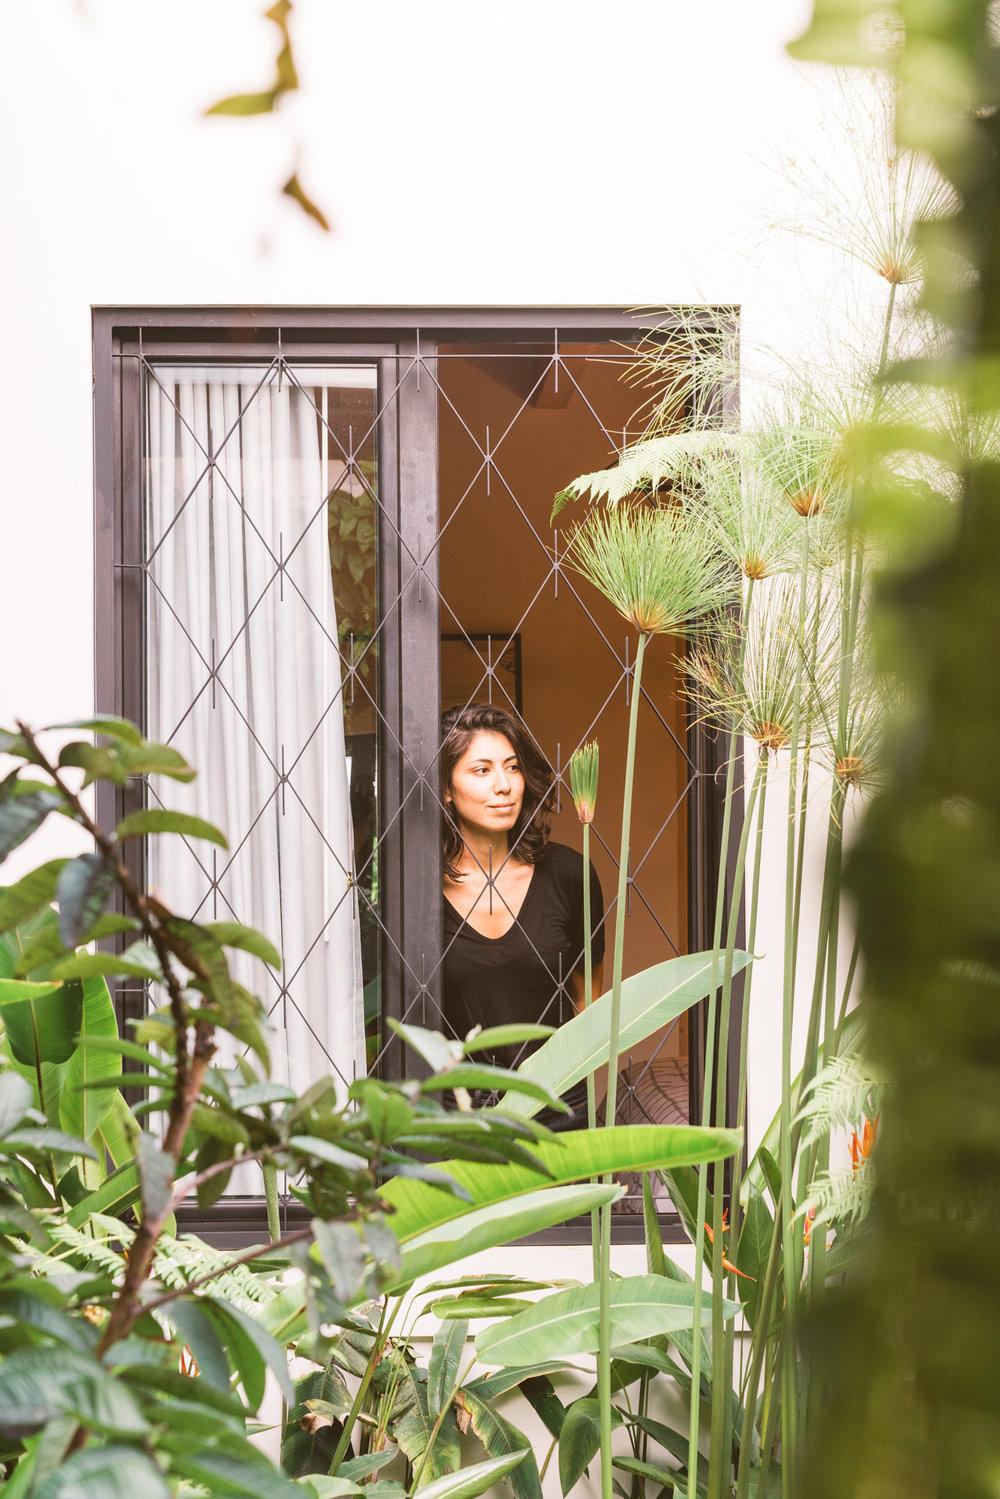 Good Hotel Antigua Window With Woman